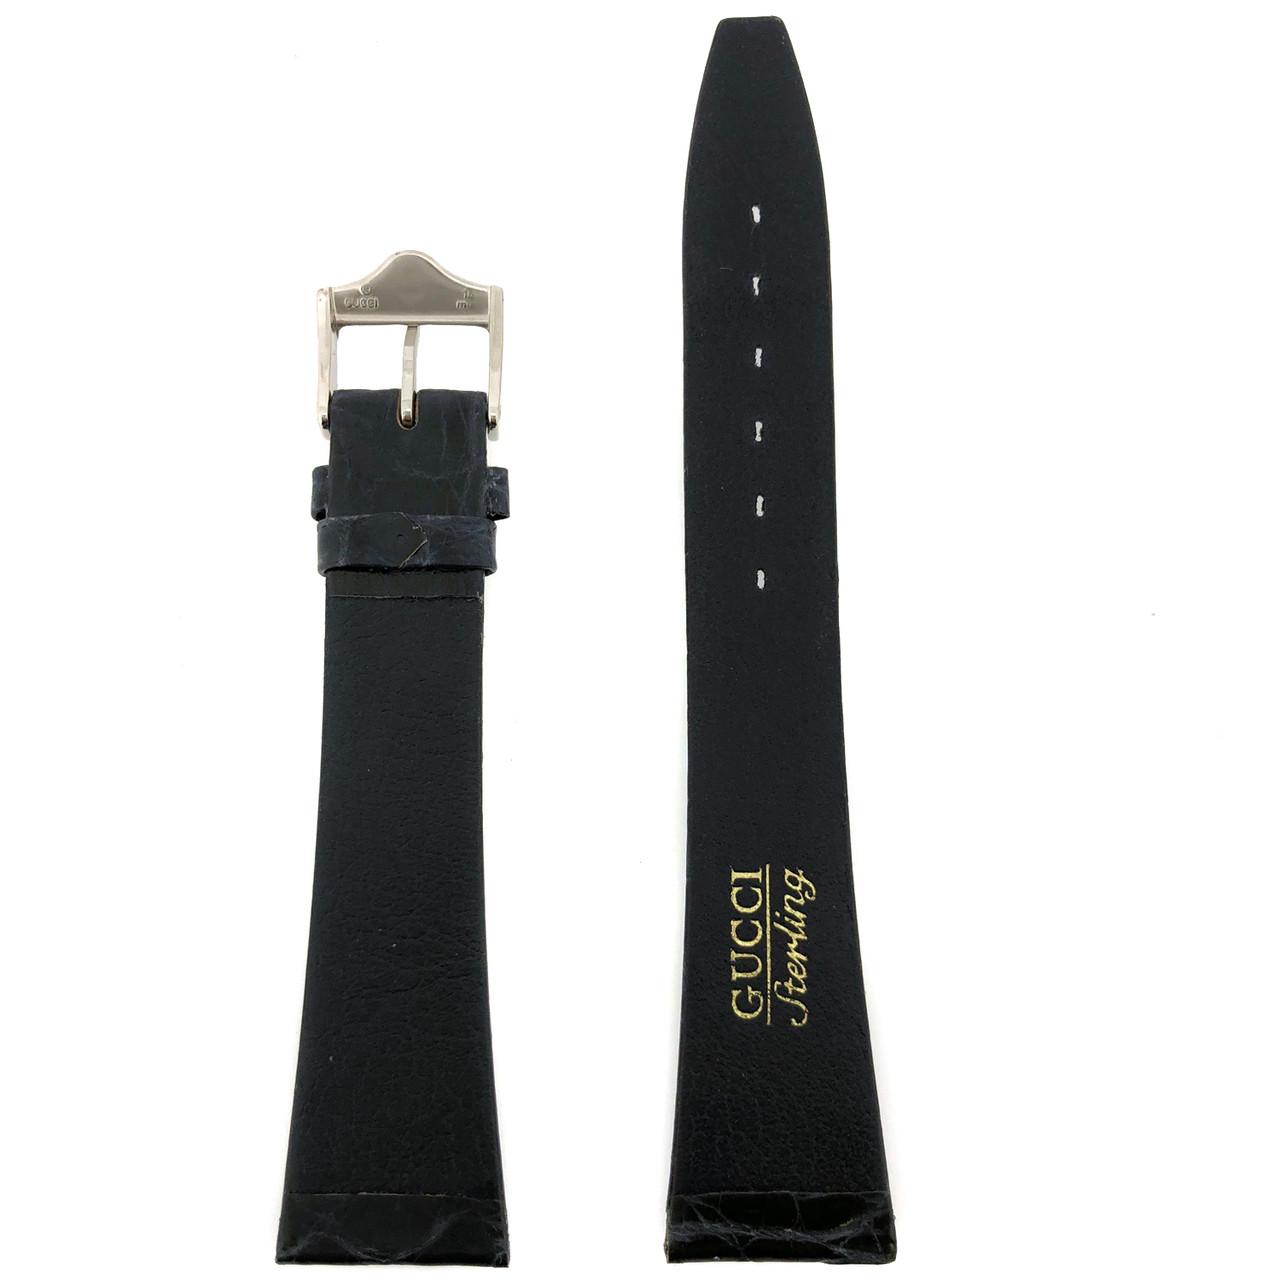 Gucci 4200M Sterling Navy Blue Watch Band Crocodile 19mm